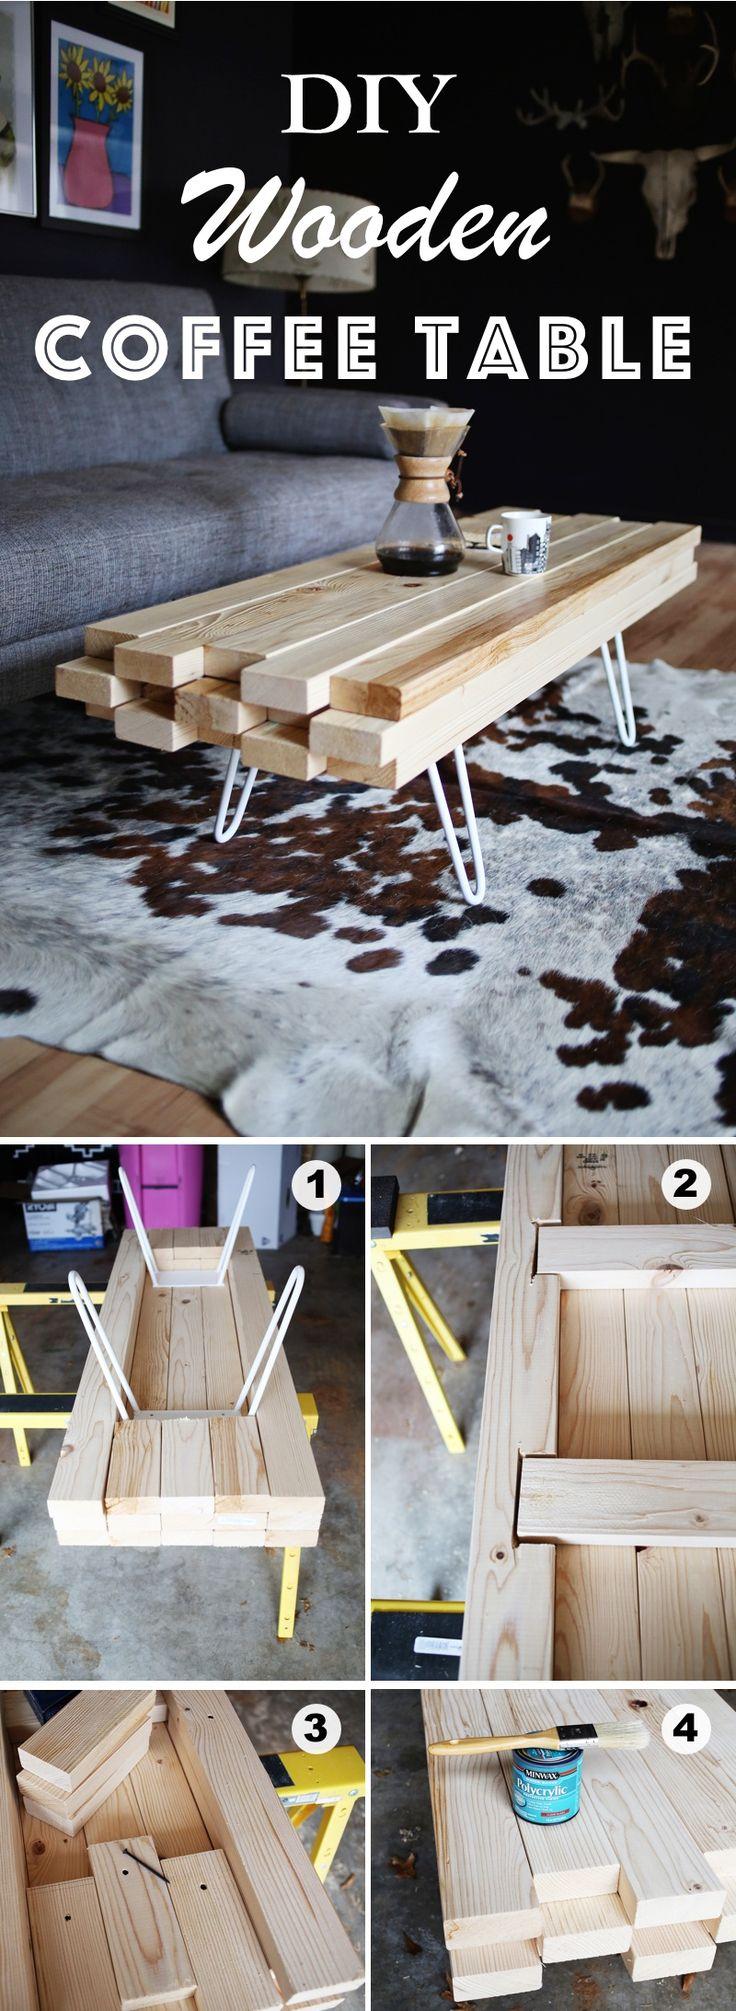 15 creative diy coffee table ideas you can build yourself